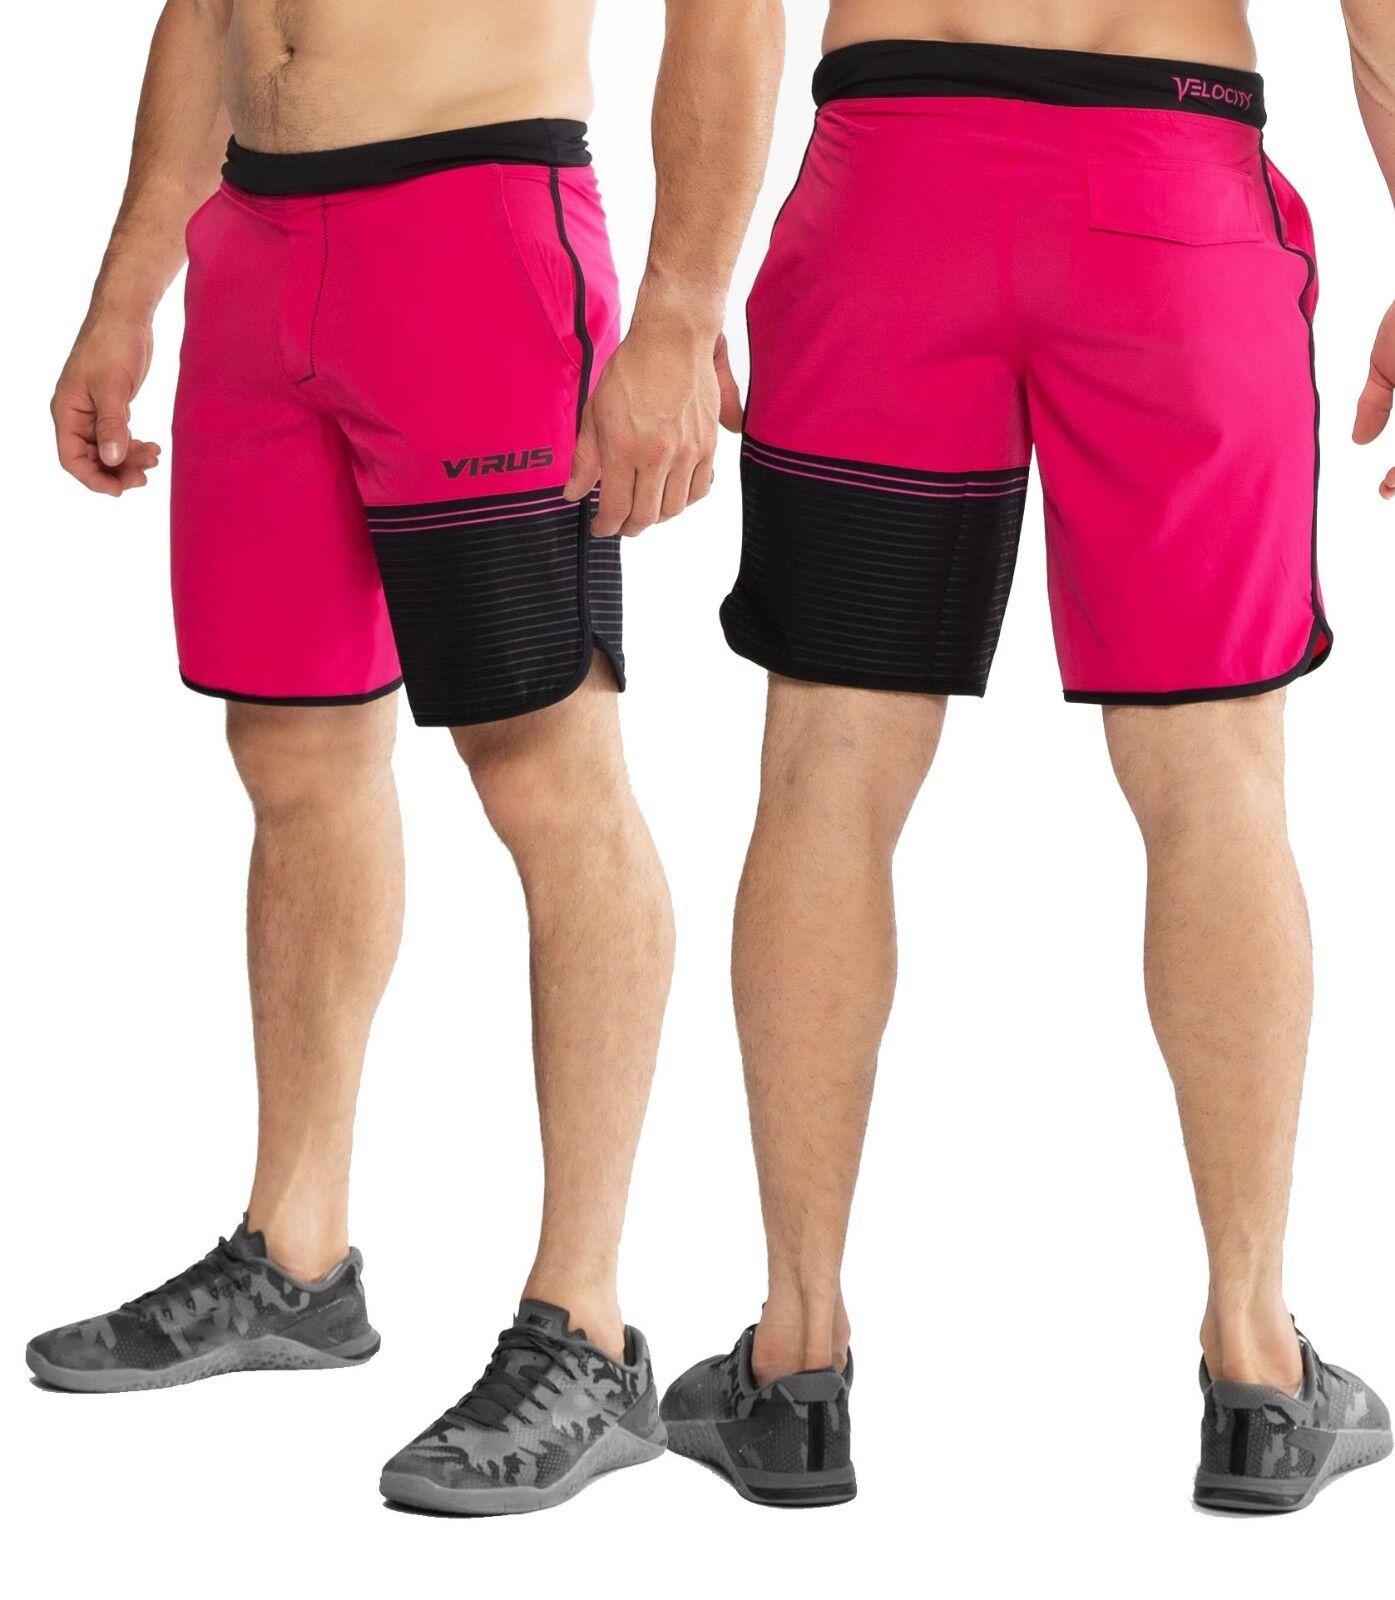 Virus Herren Velocity Himbeere Shorts St5, Fitness, Crossfit, Workout, Laufen,